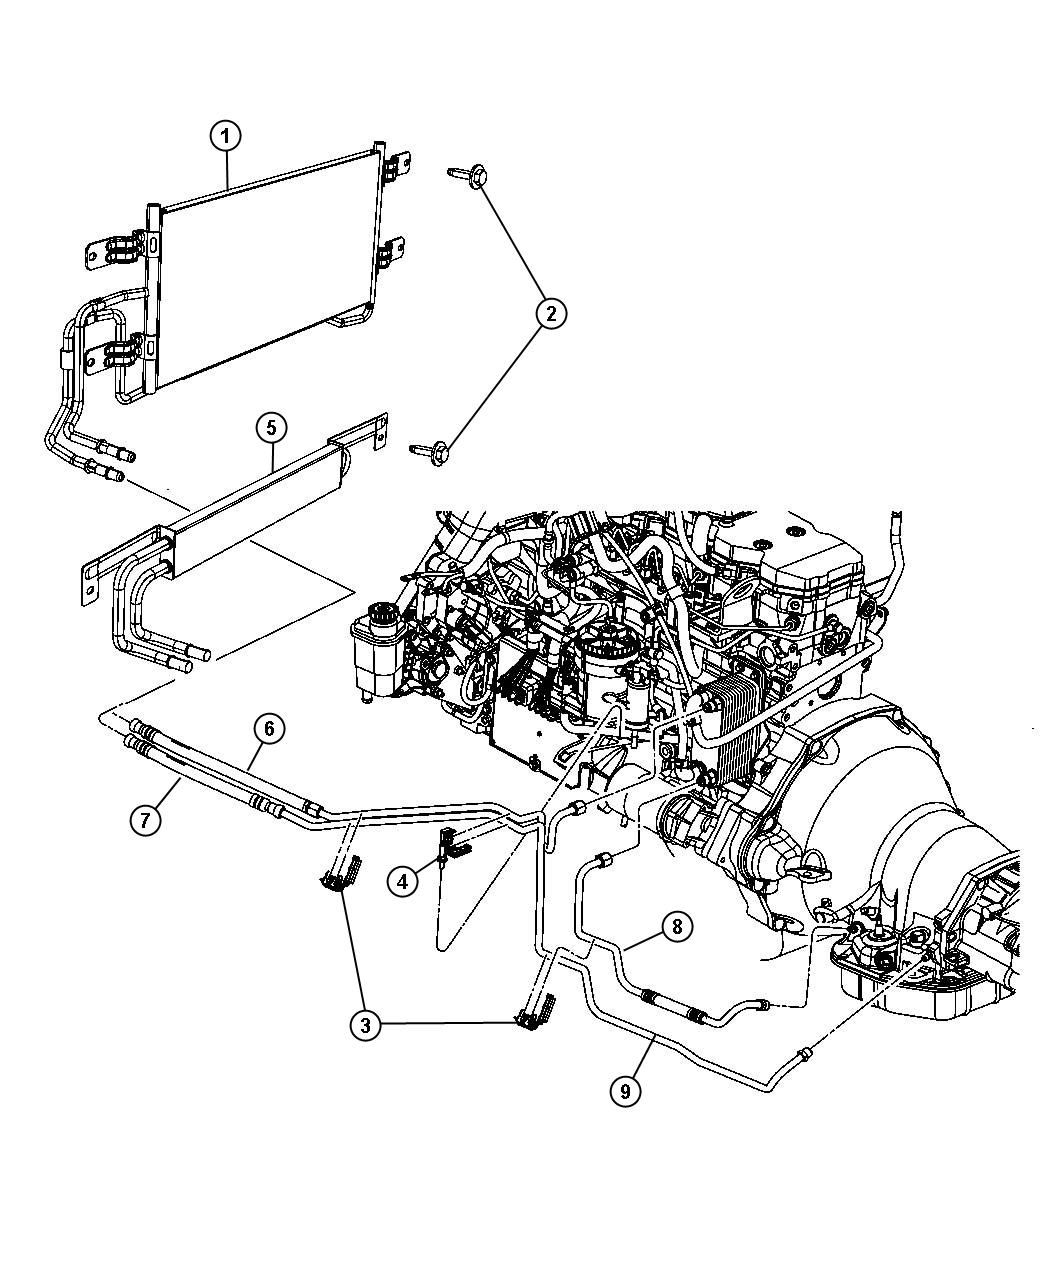 dodge six sd transmission diagram  dodge  free engine